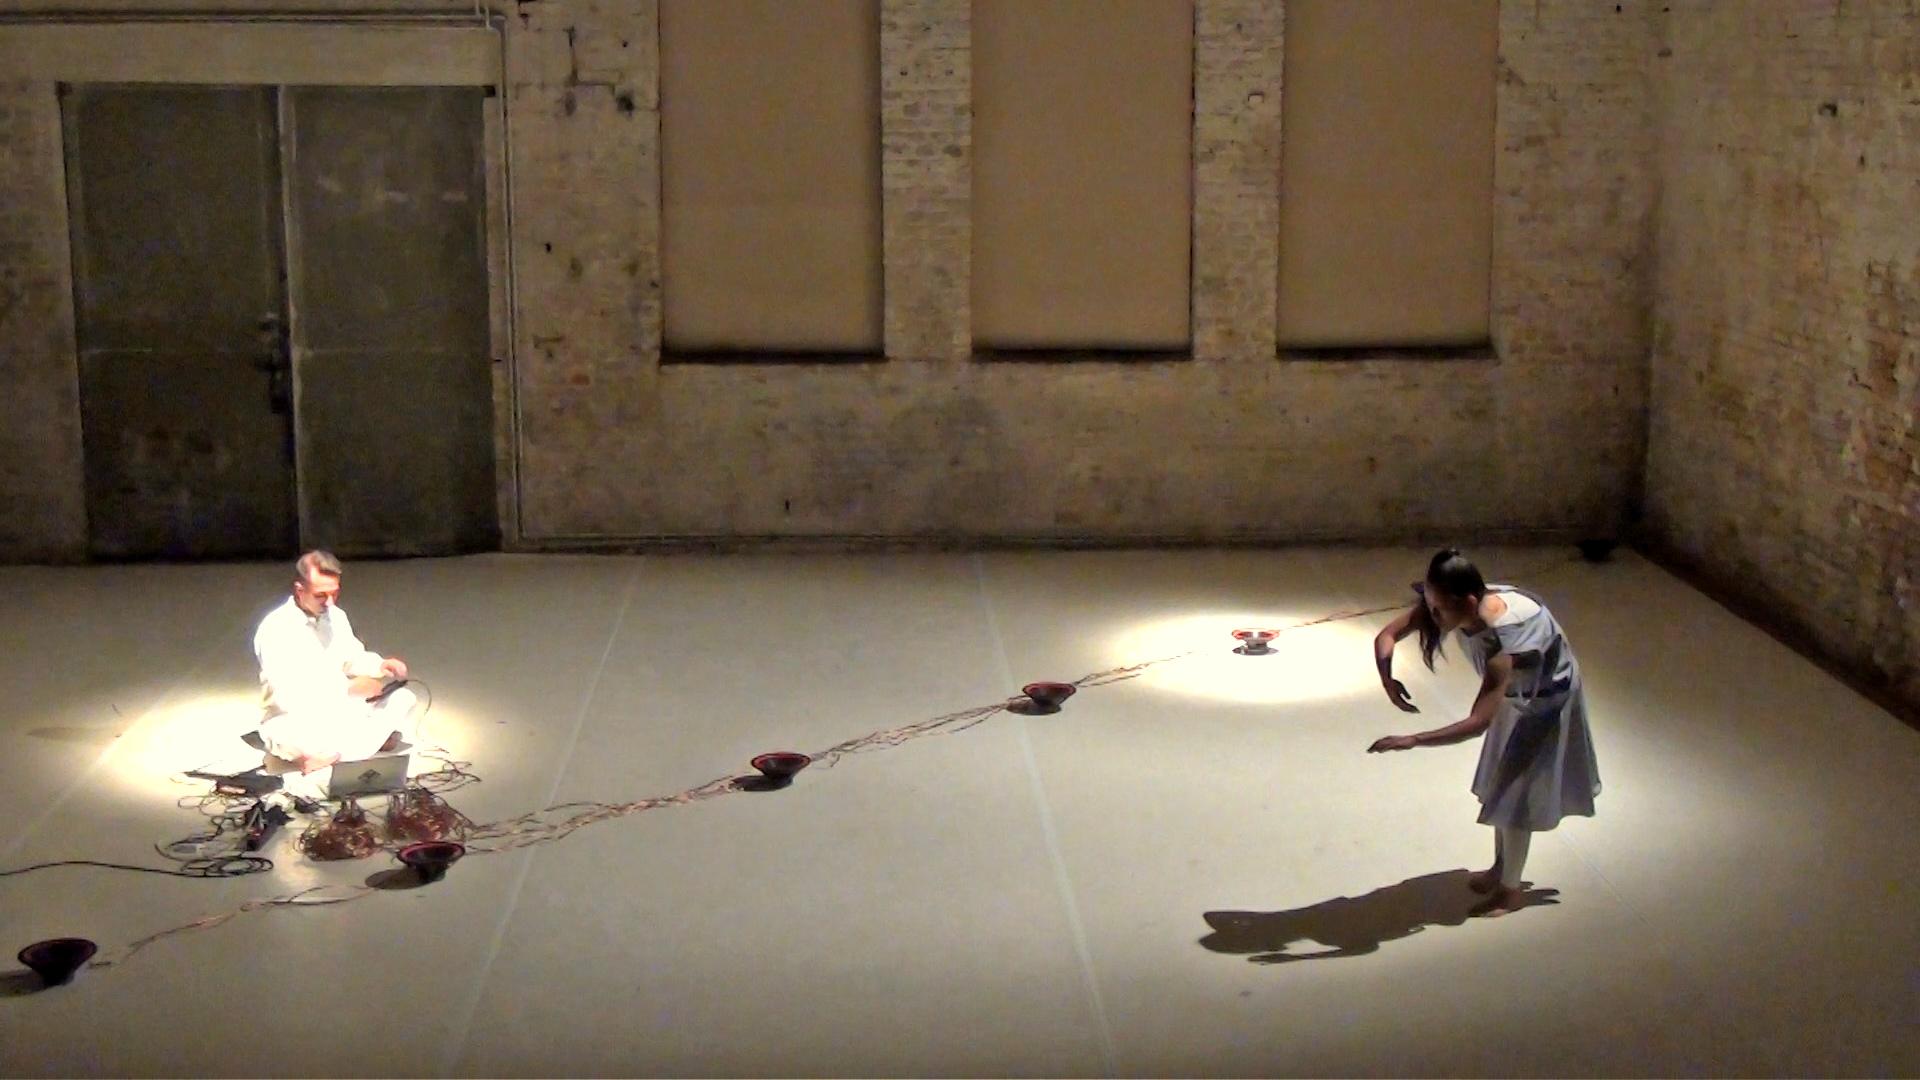 image from video of Yoann Trellu